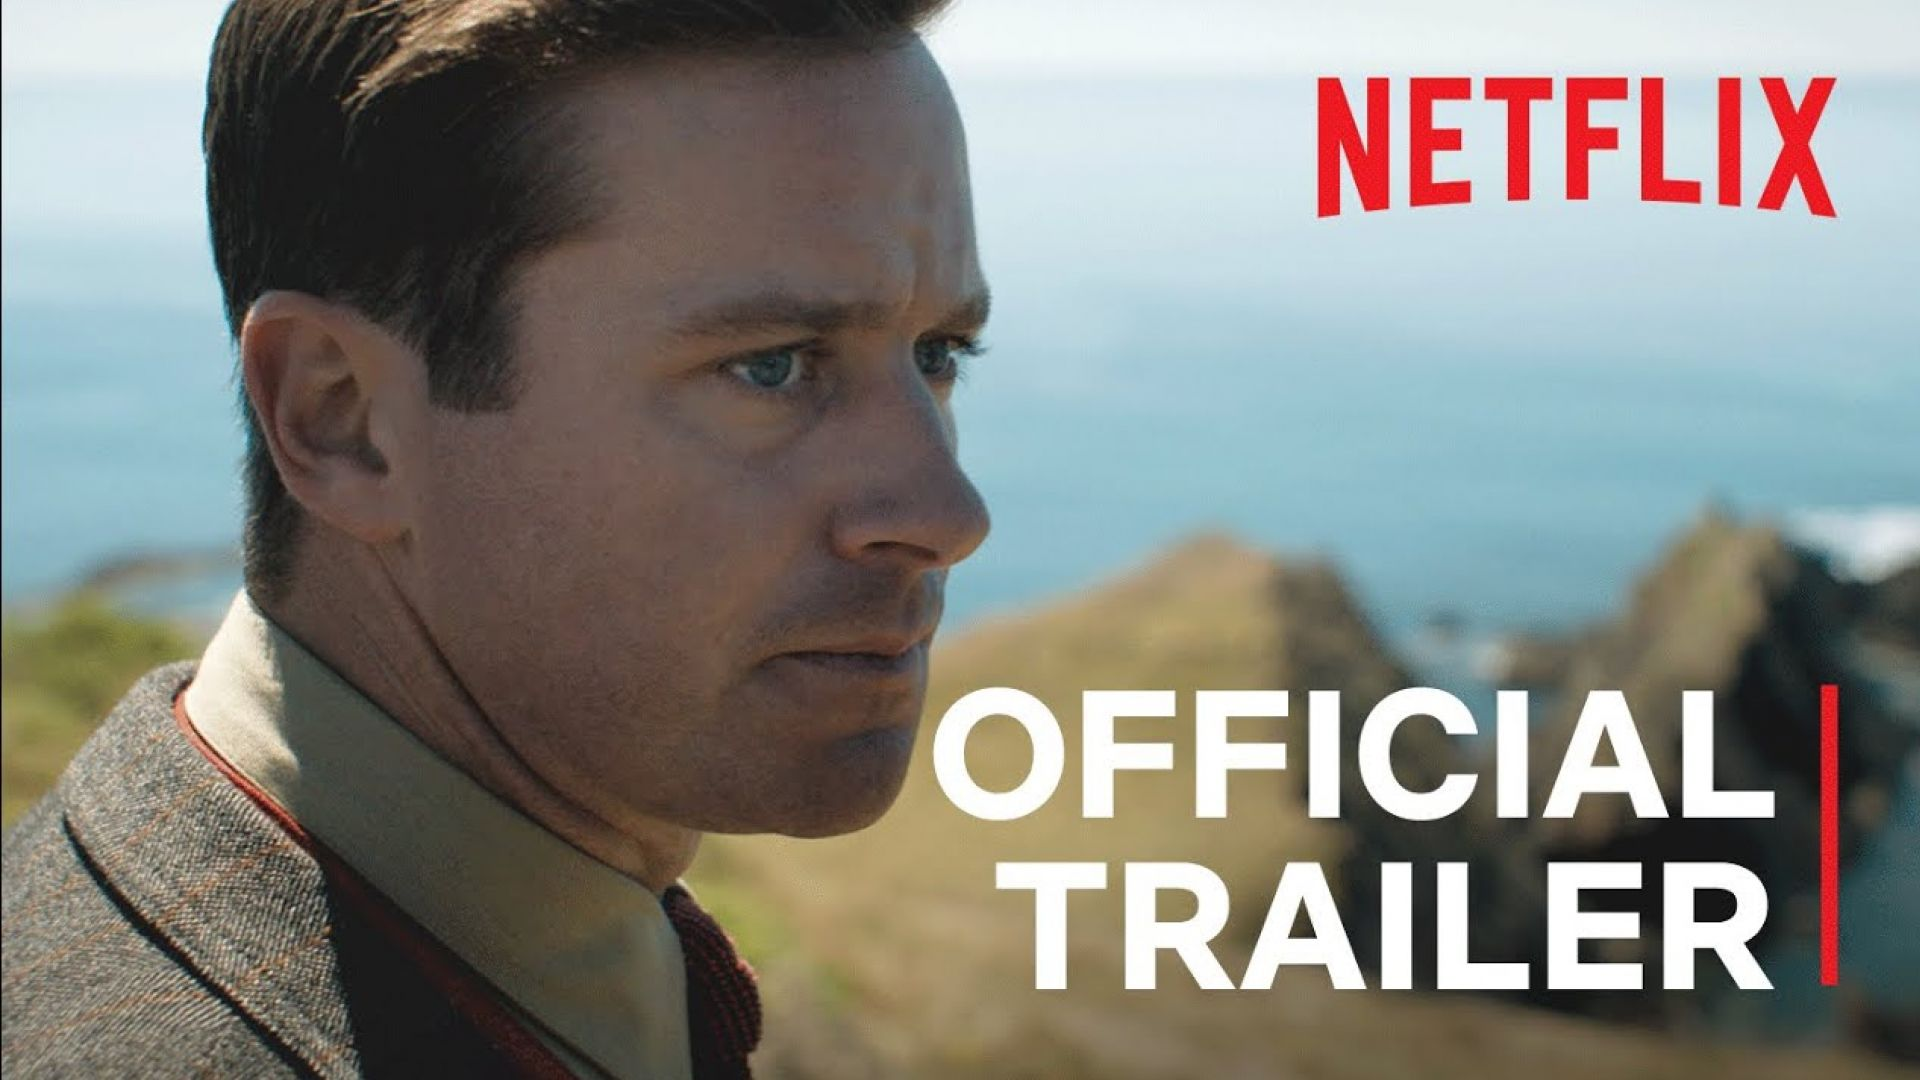 'Rebecca' Trailer • Netflix October 21